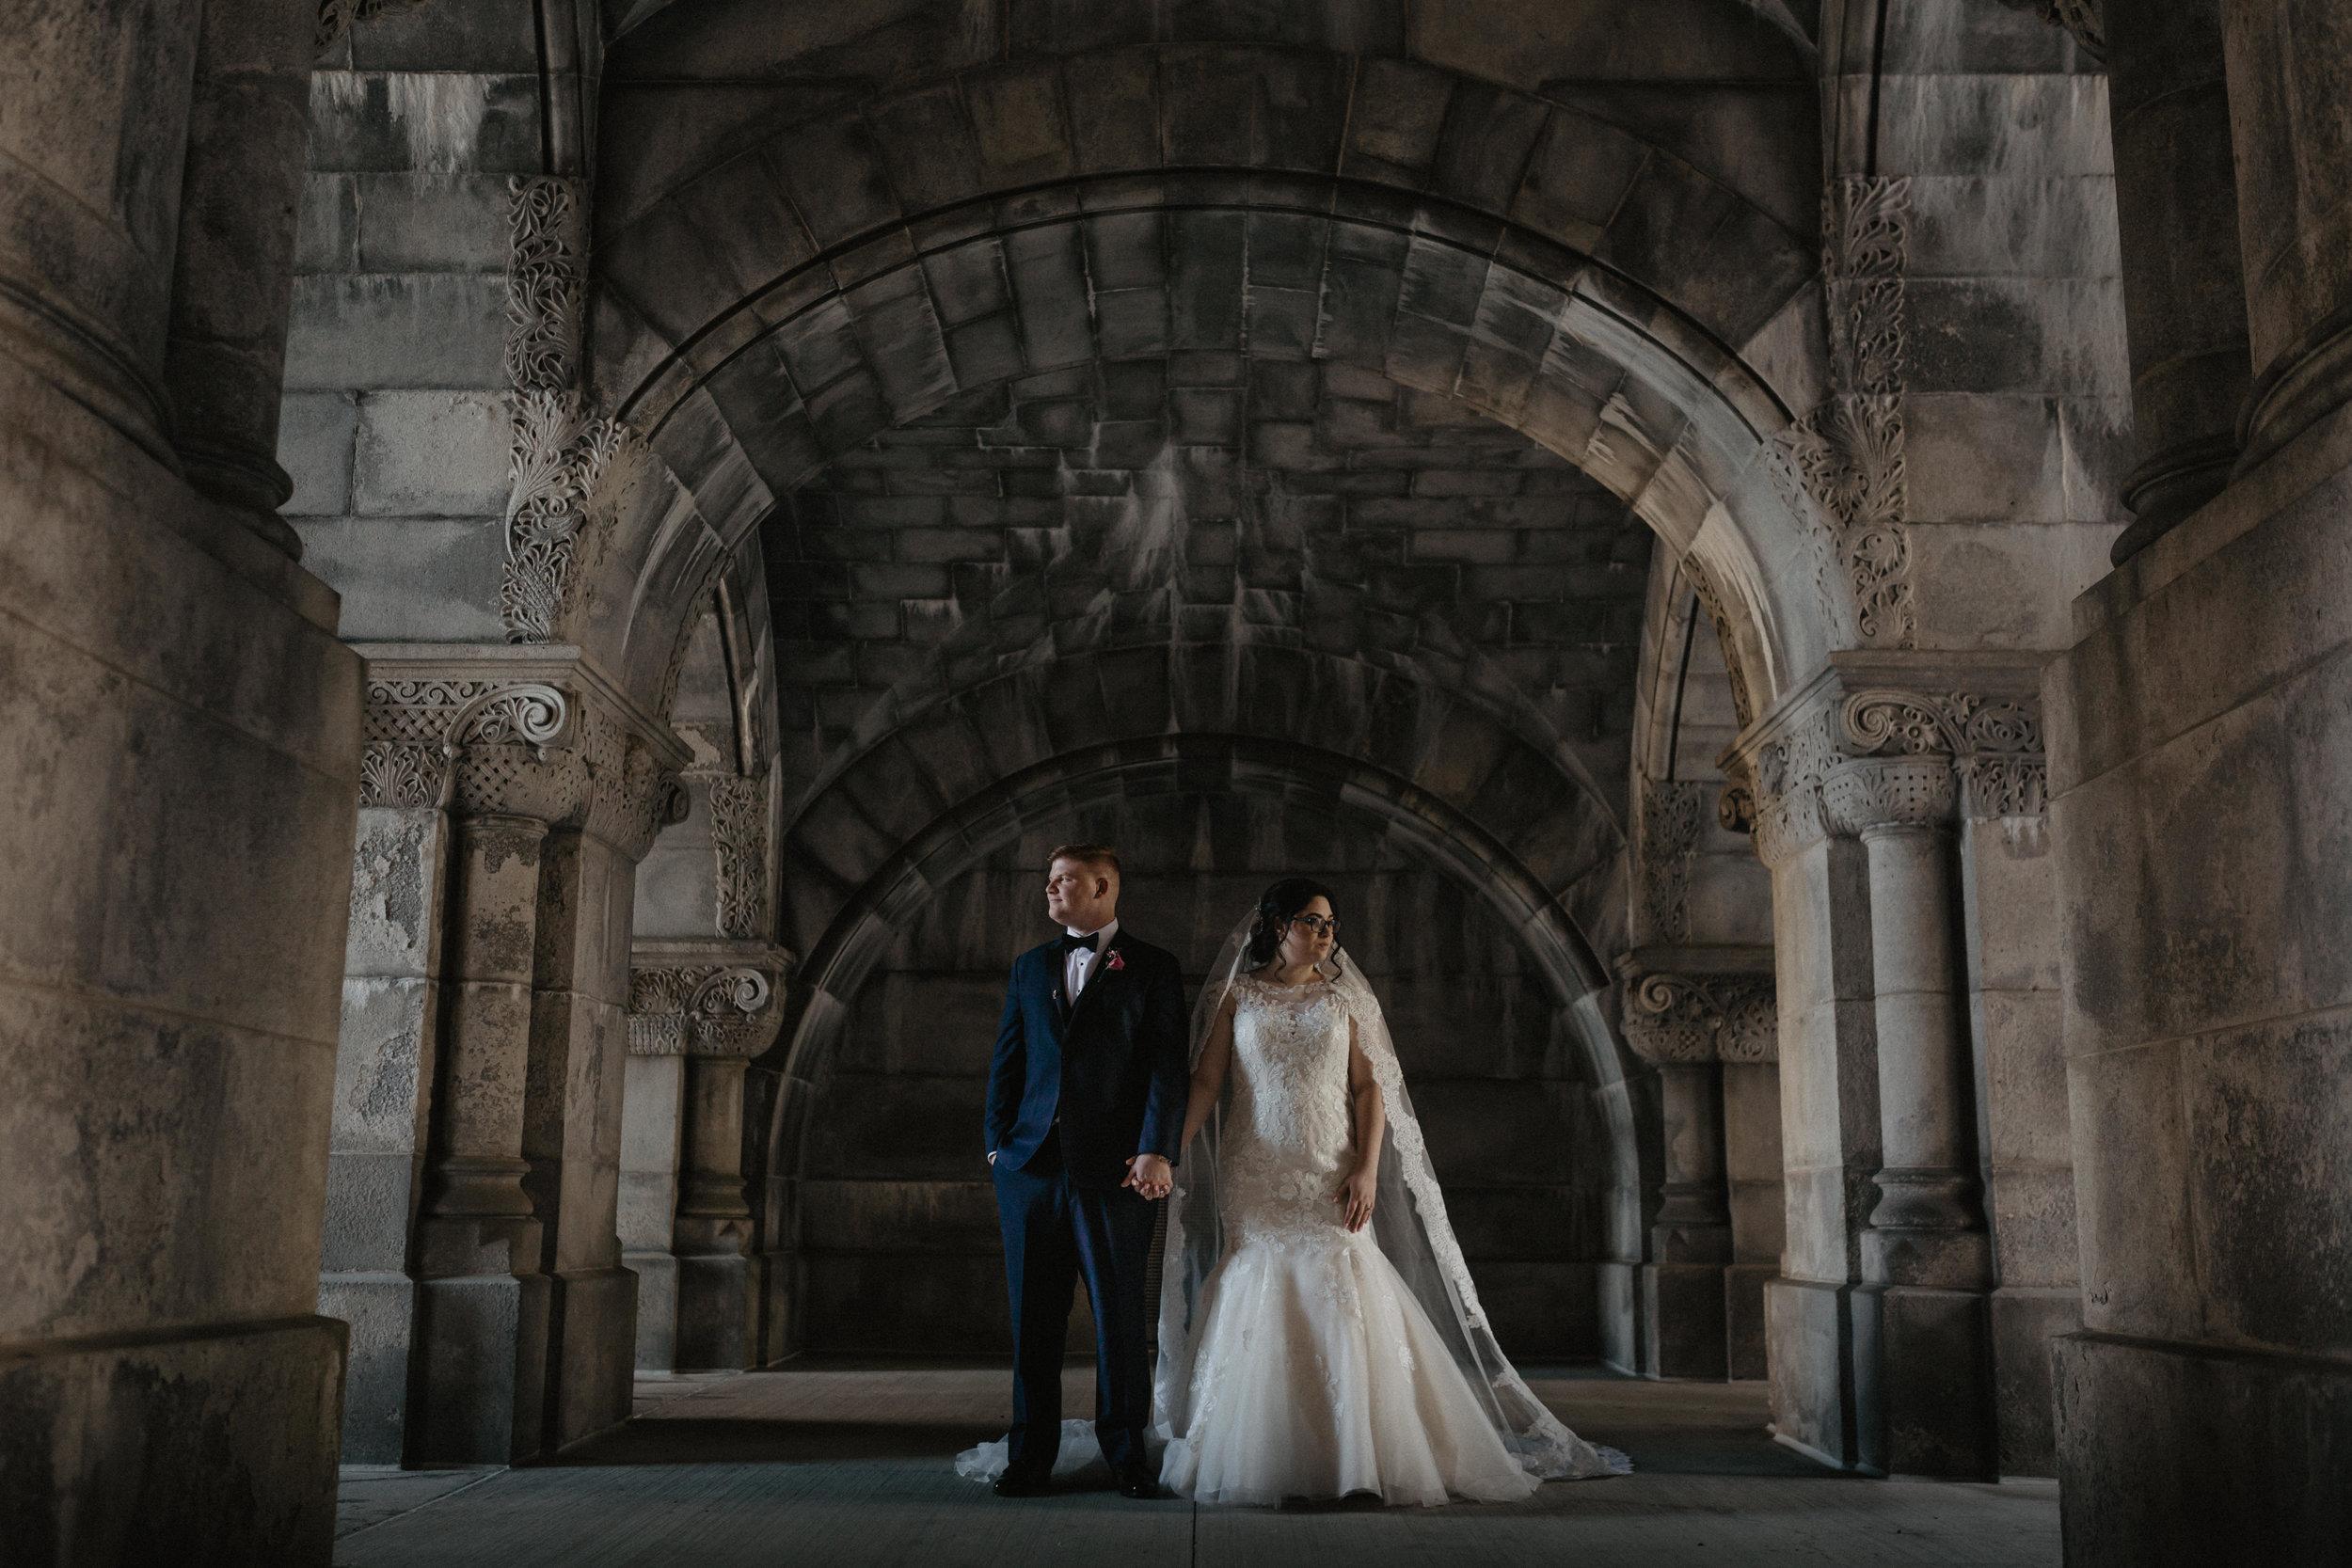 albany-new-york-wedding-39.jpg